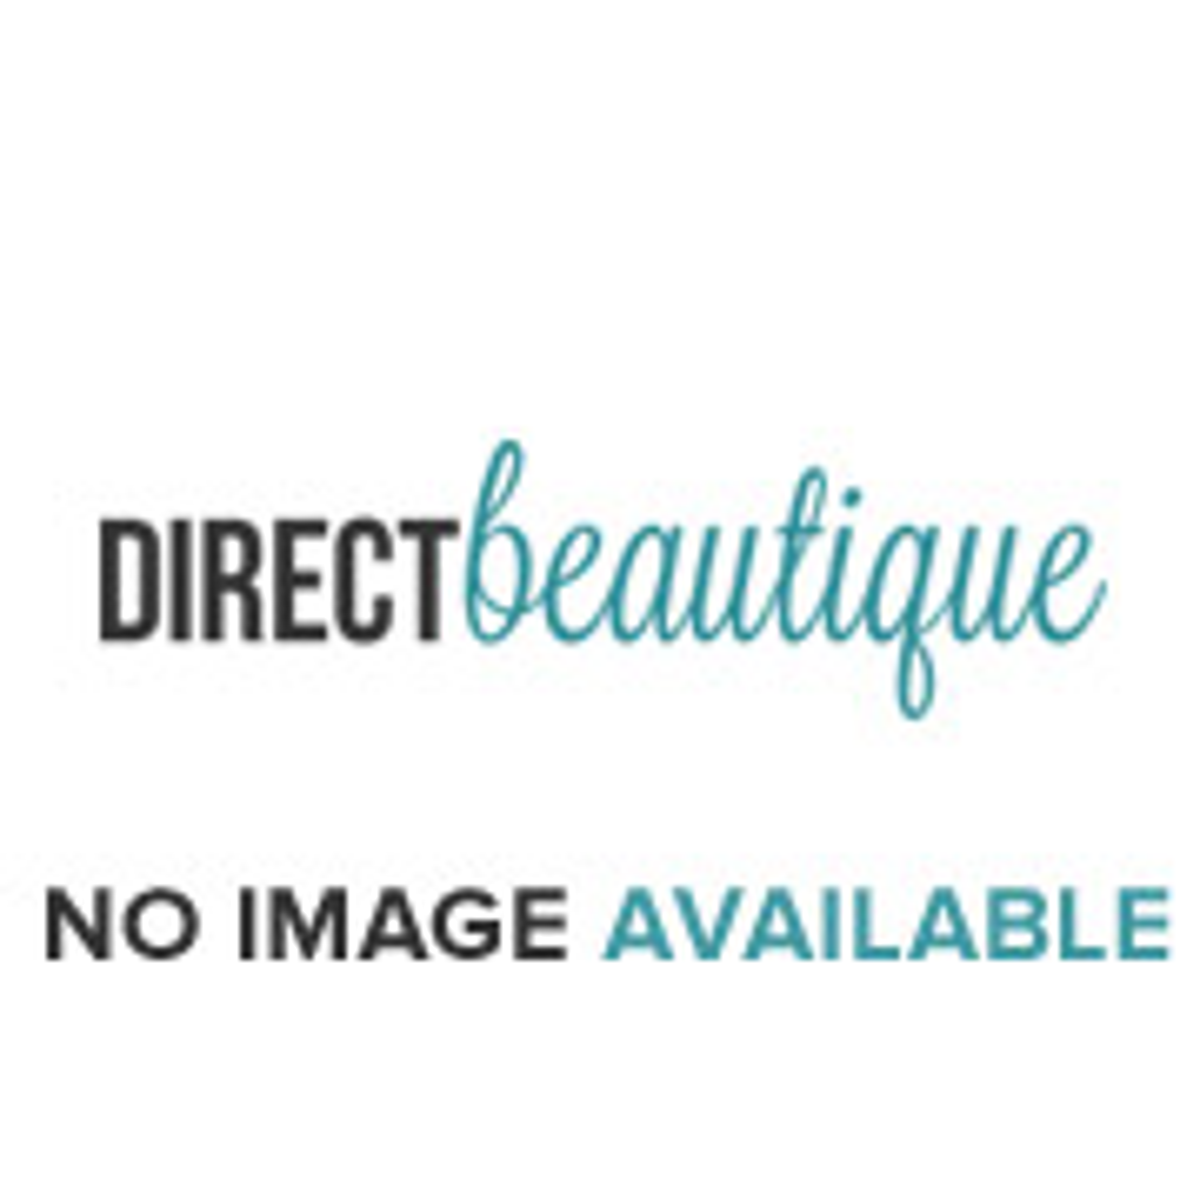 Clinique Stay Matte Oil Free Makeup 15 Beige 30ml